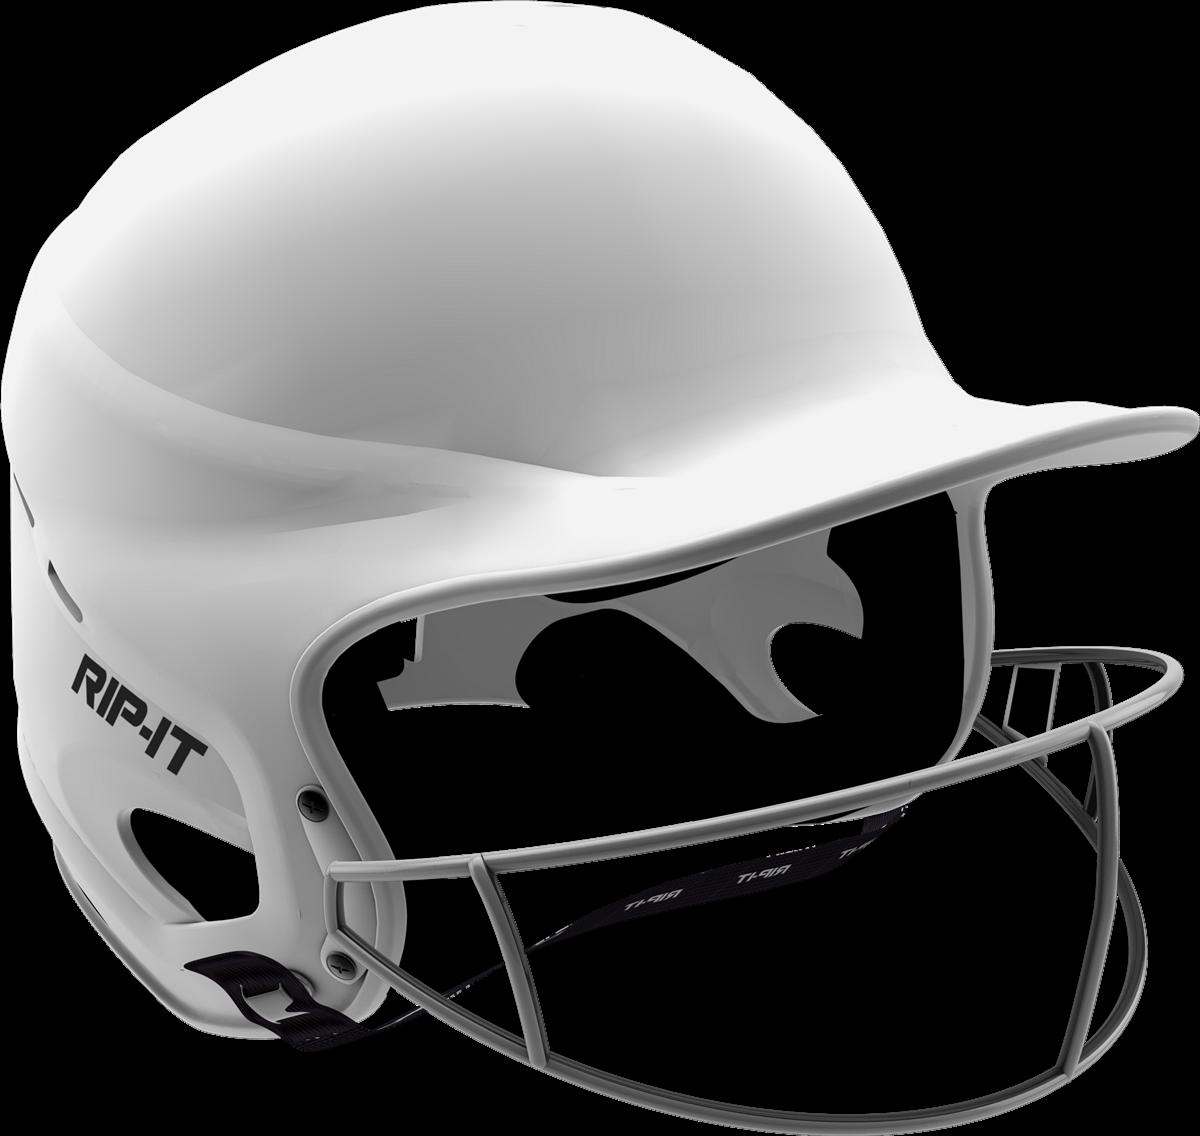 Baseball helmet clipart black and white image free stock RIP-IT Vision Pro Matte Softball Batting Helmet | Softball.com image free stock